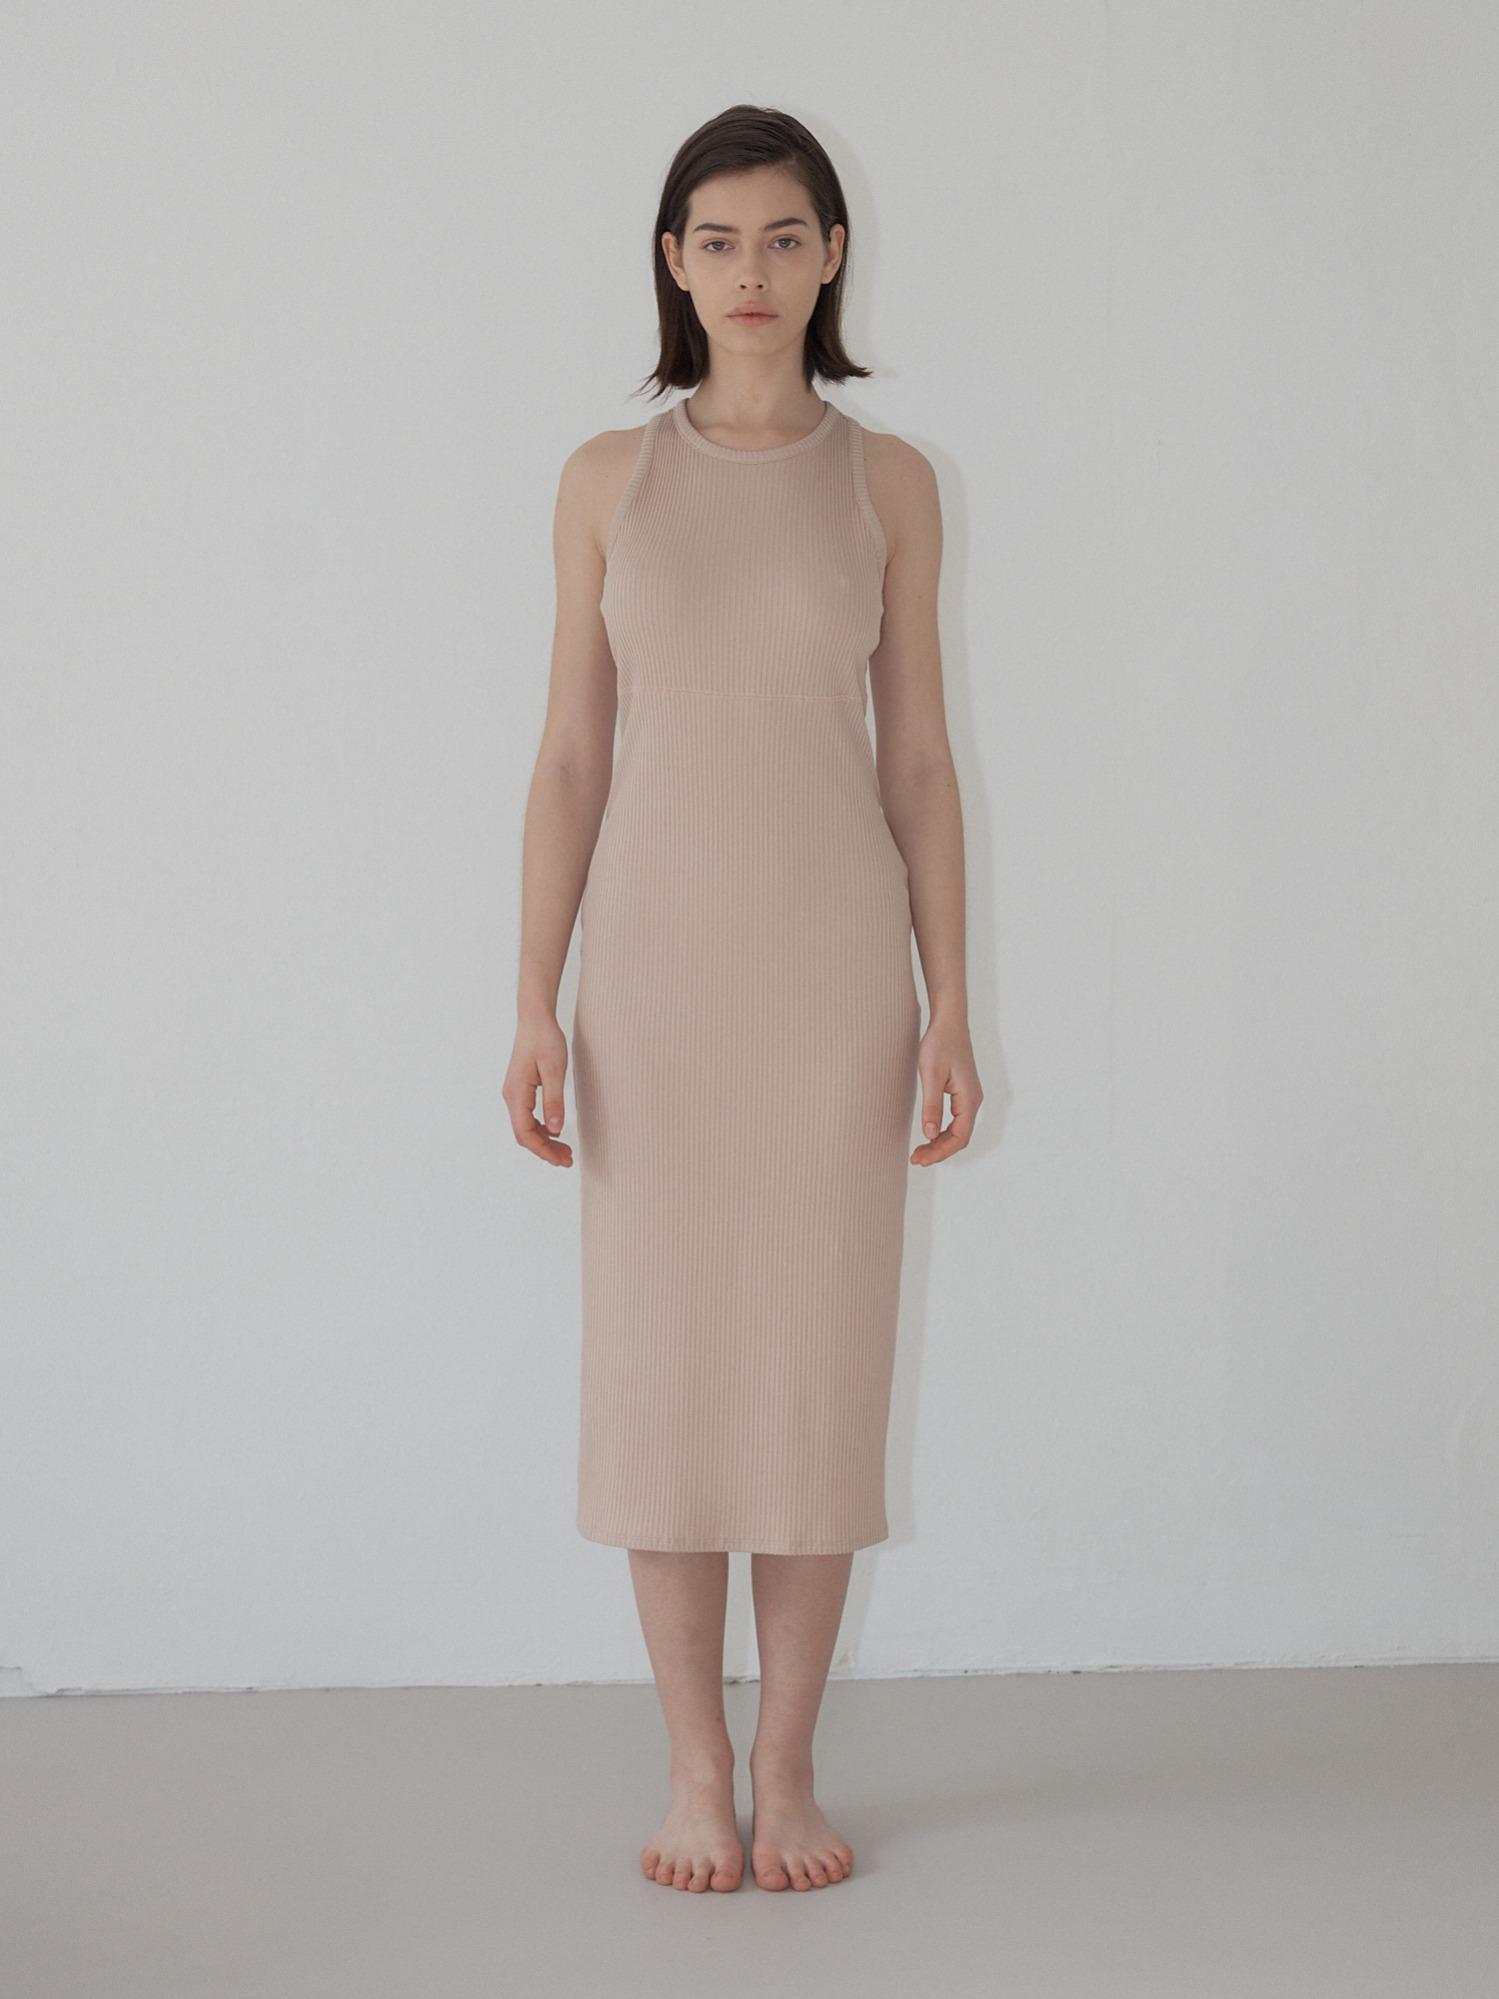 EXCLUSIVE: Tank dress